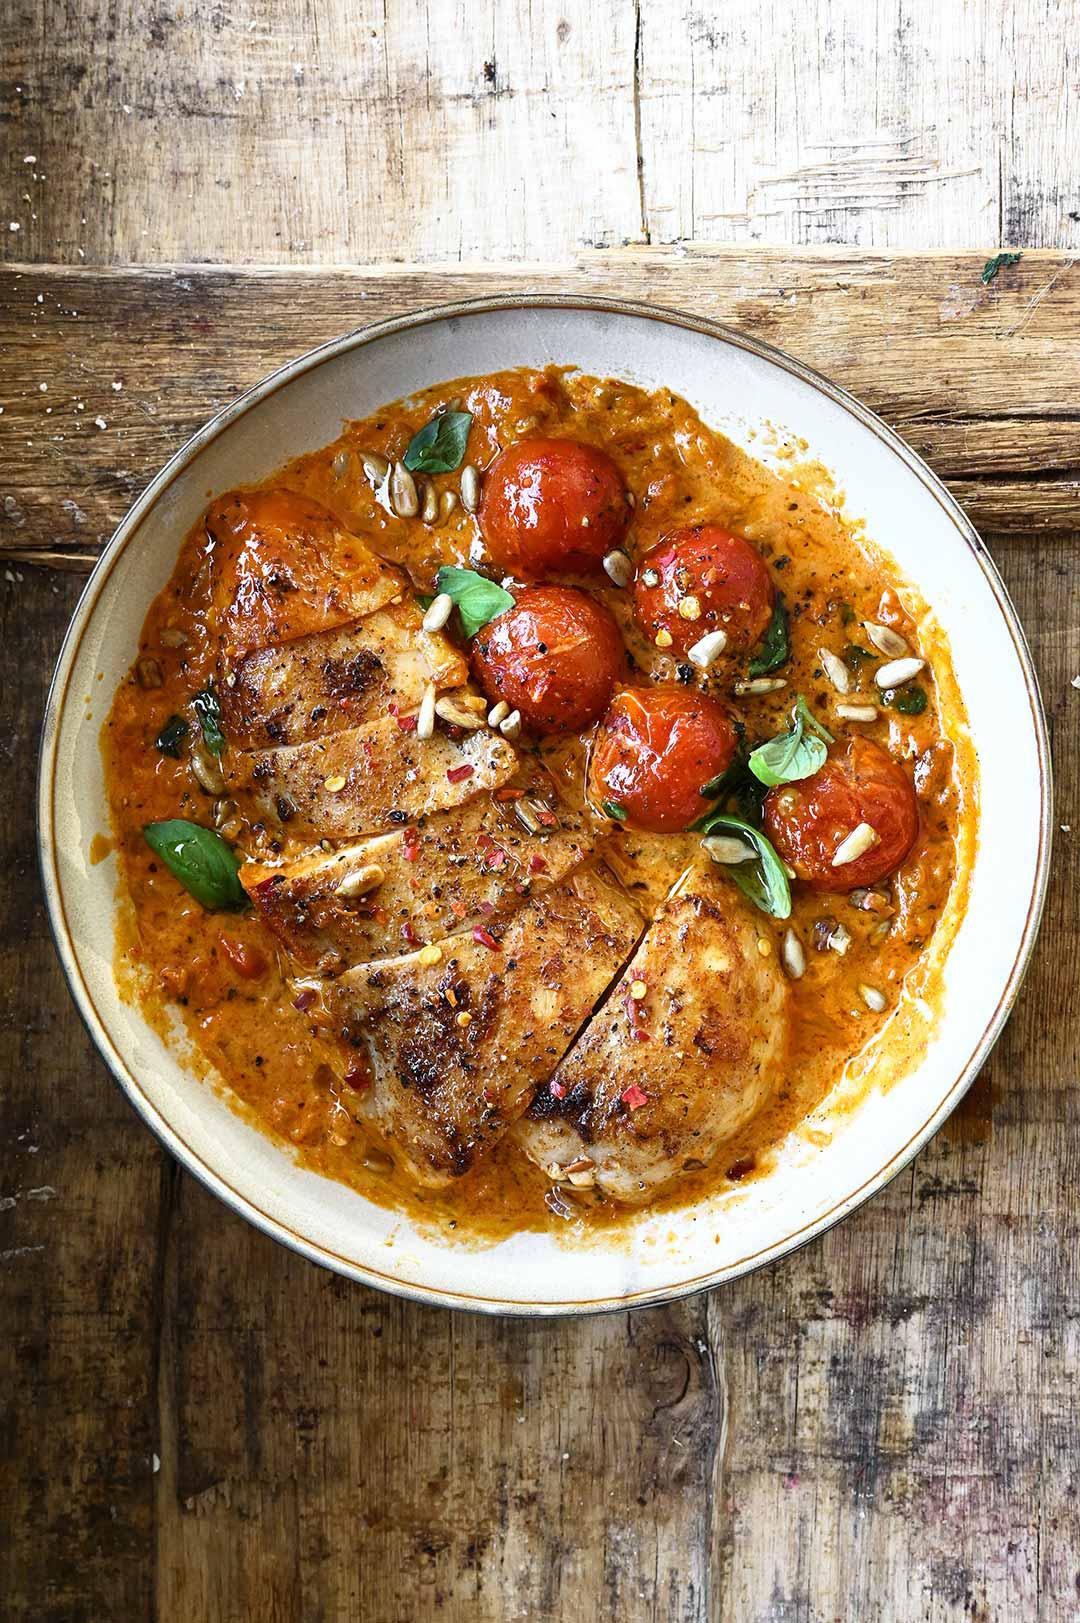 serving dumplings | Creamy Garlic Red Pesto Chicken